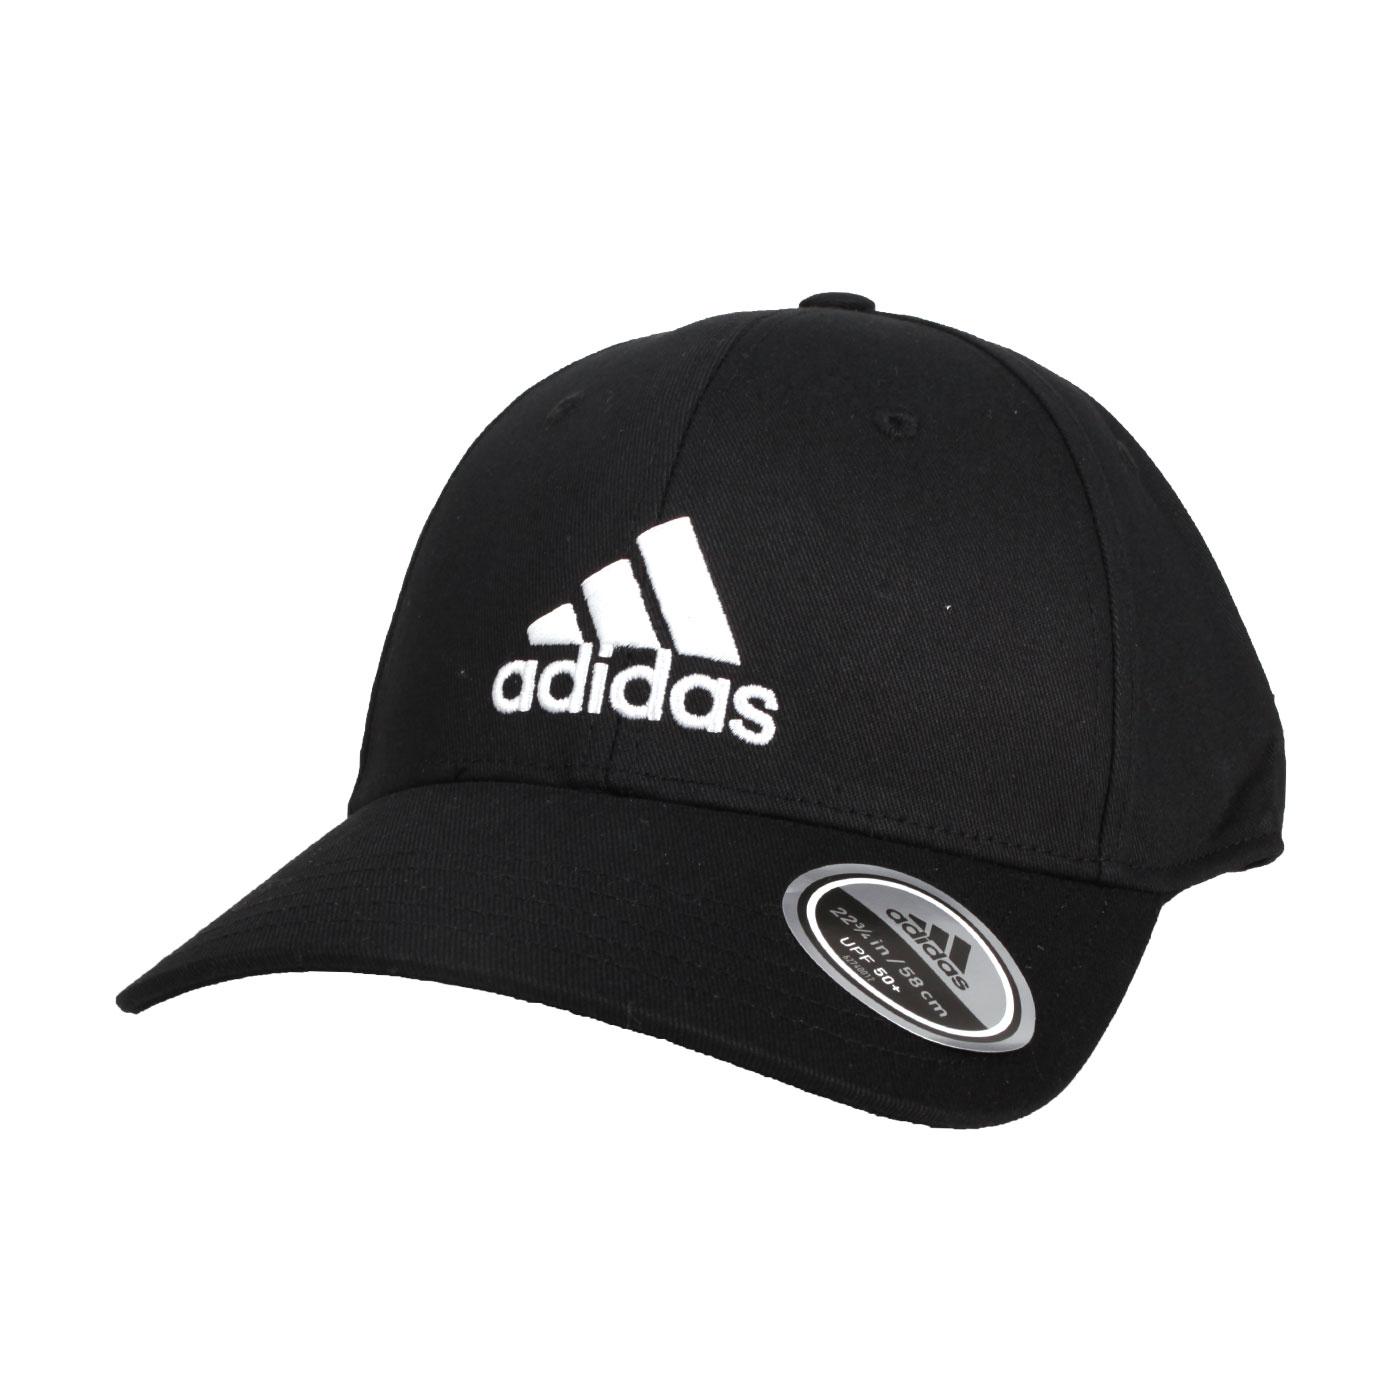 ADIDAS 運動帽 FK0891 - 黑白